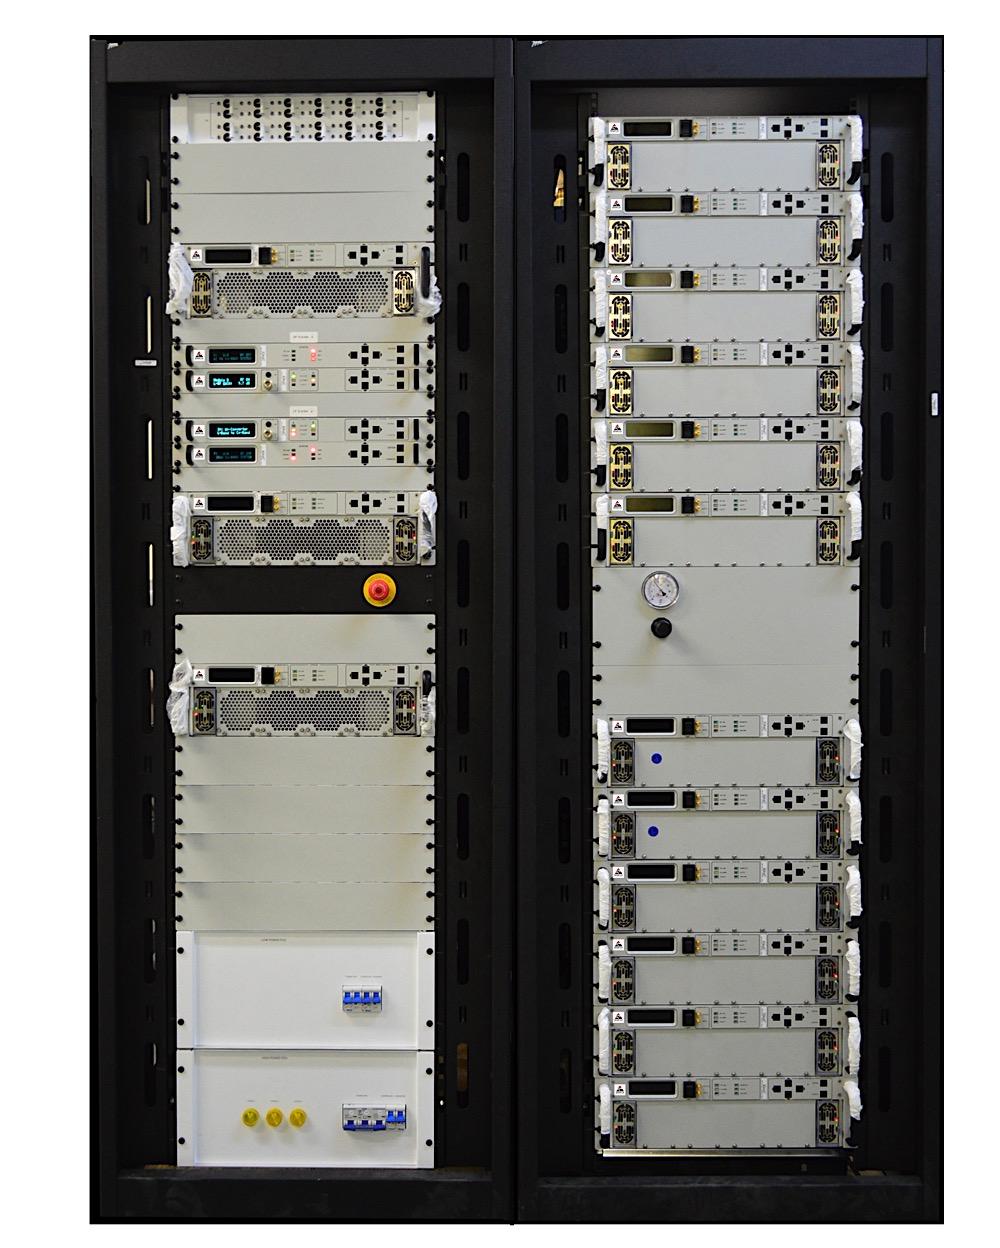 X Band 6600W BUC SSPB SSPA Rackmount GaN-2018